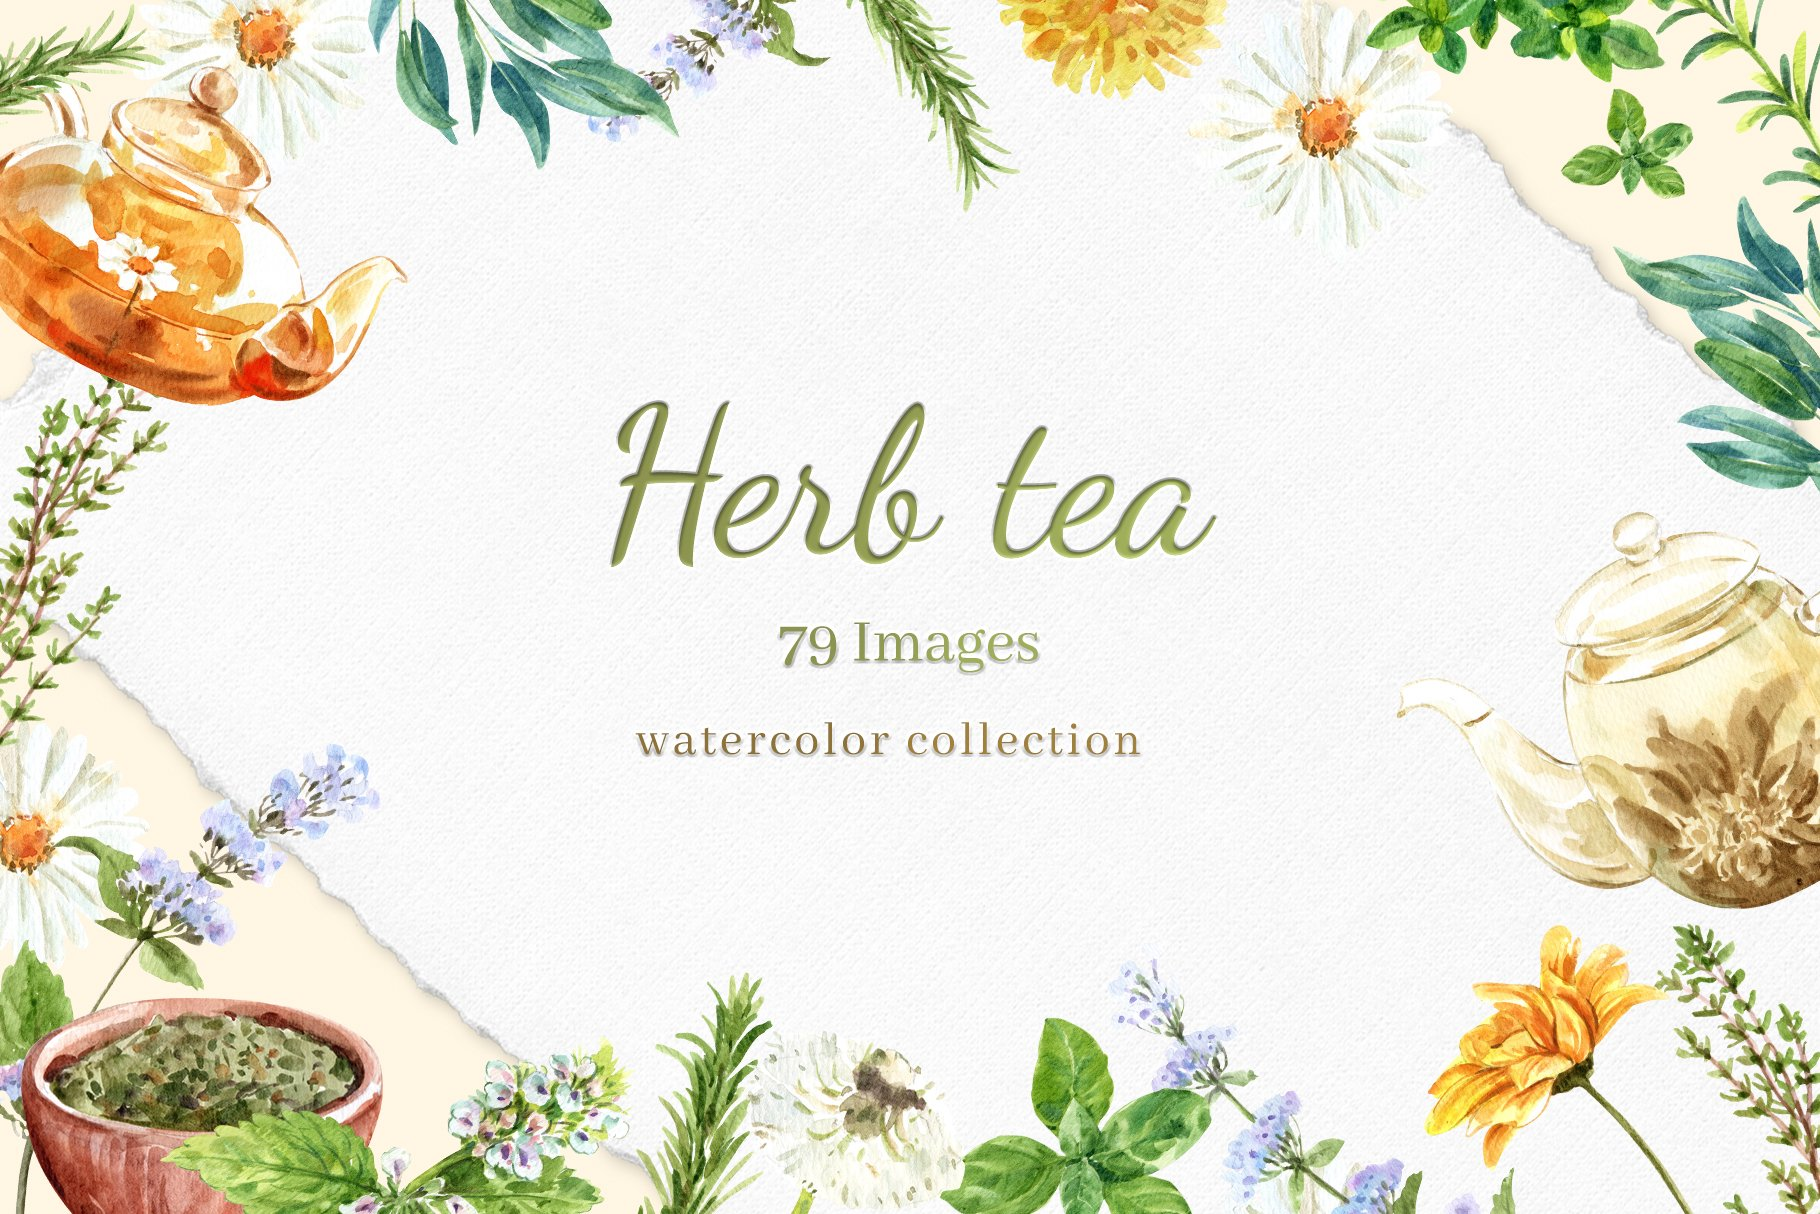 茶叶健康养生元素水彩画PNG免抠图片素材套装 Tea Time With Herbal Tea For Health插图